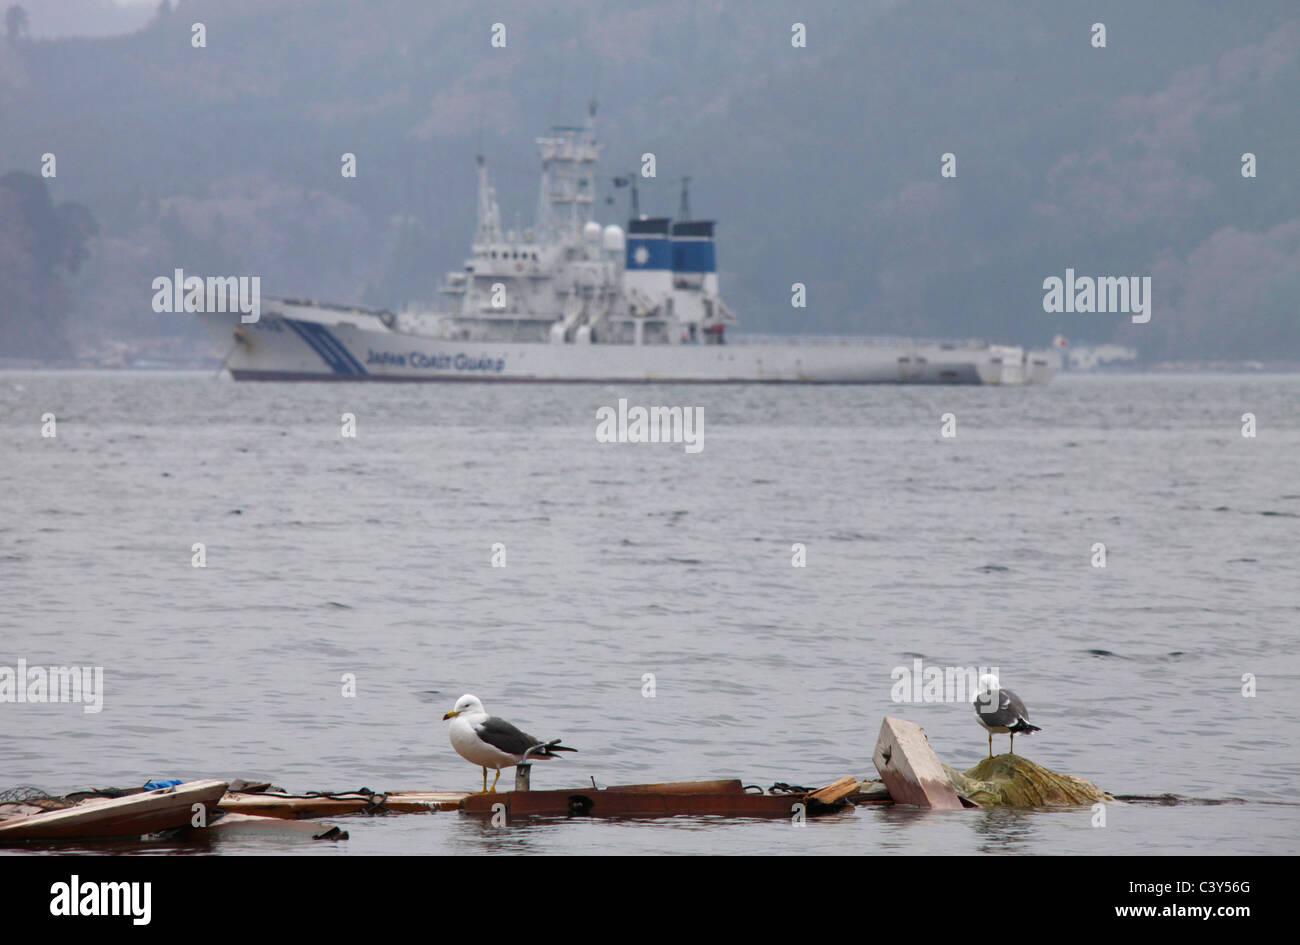 Sea birds on floating wreckage Japan Coast Guard ship PL-02 Erimo background Otsuchi-cho town Iwate Japan - Stock Image